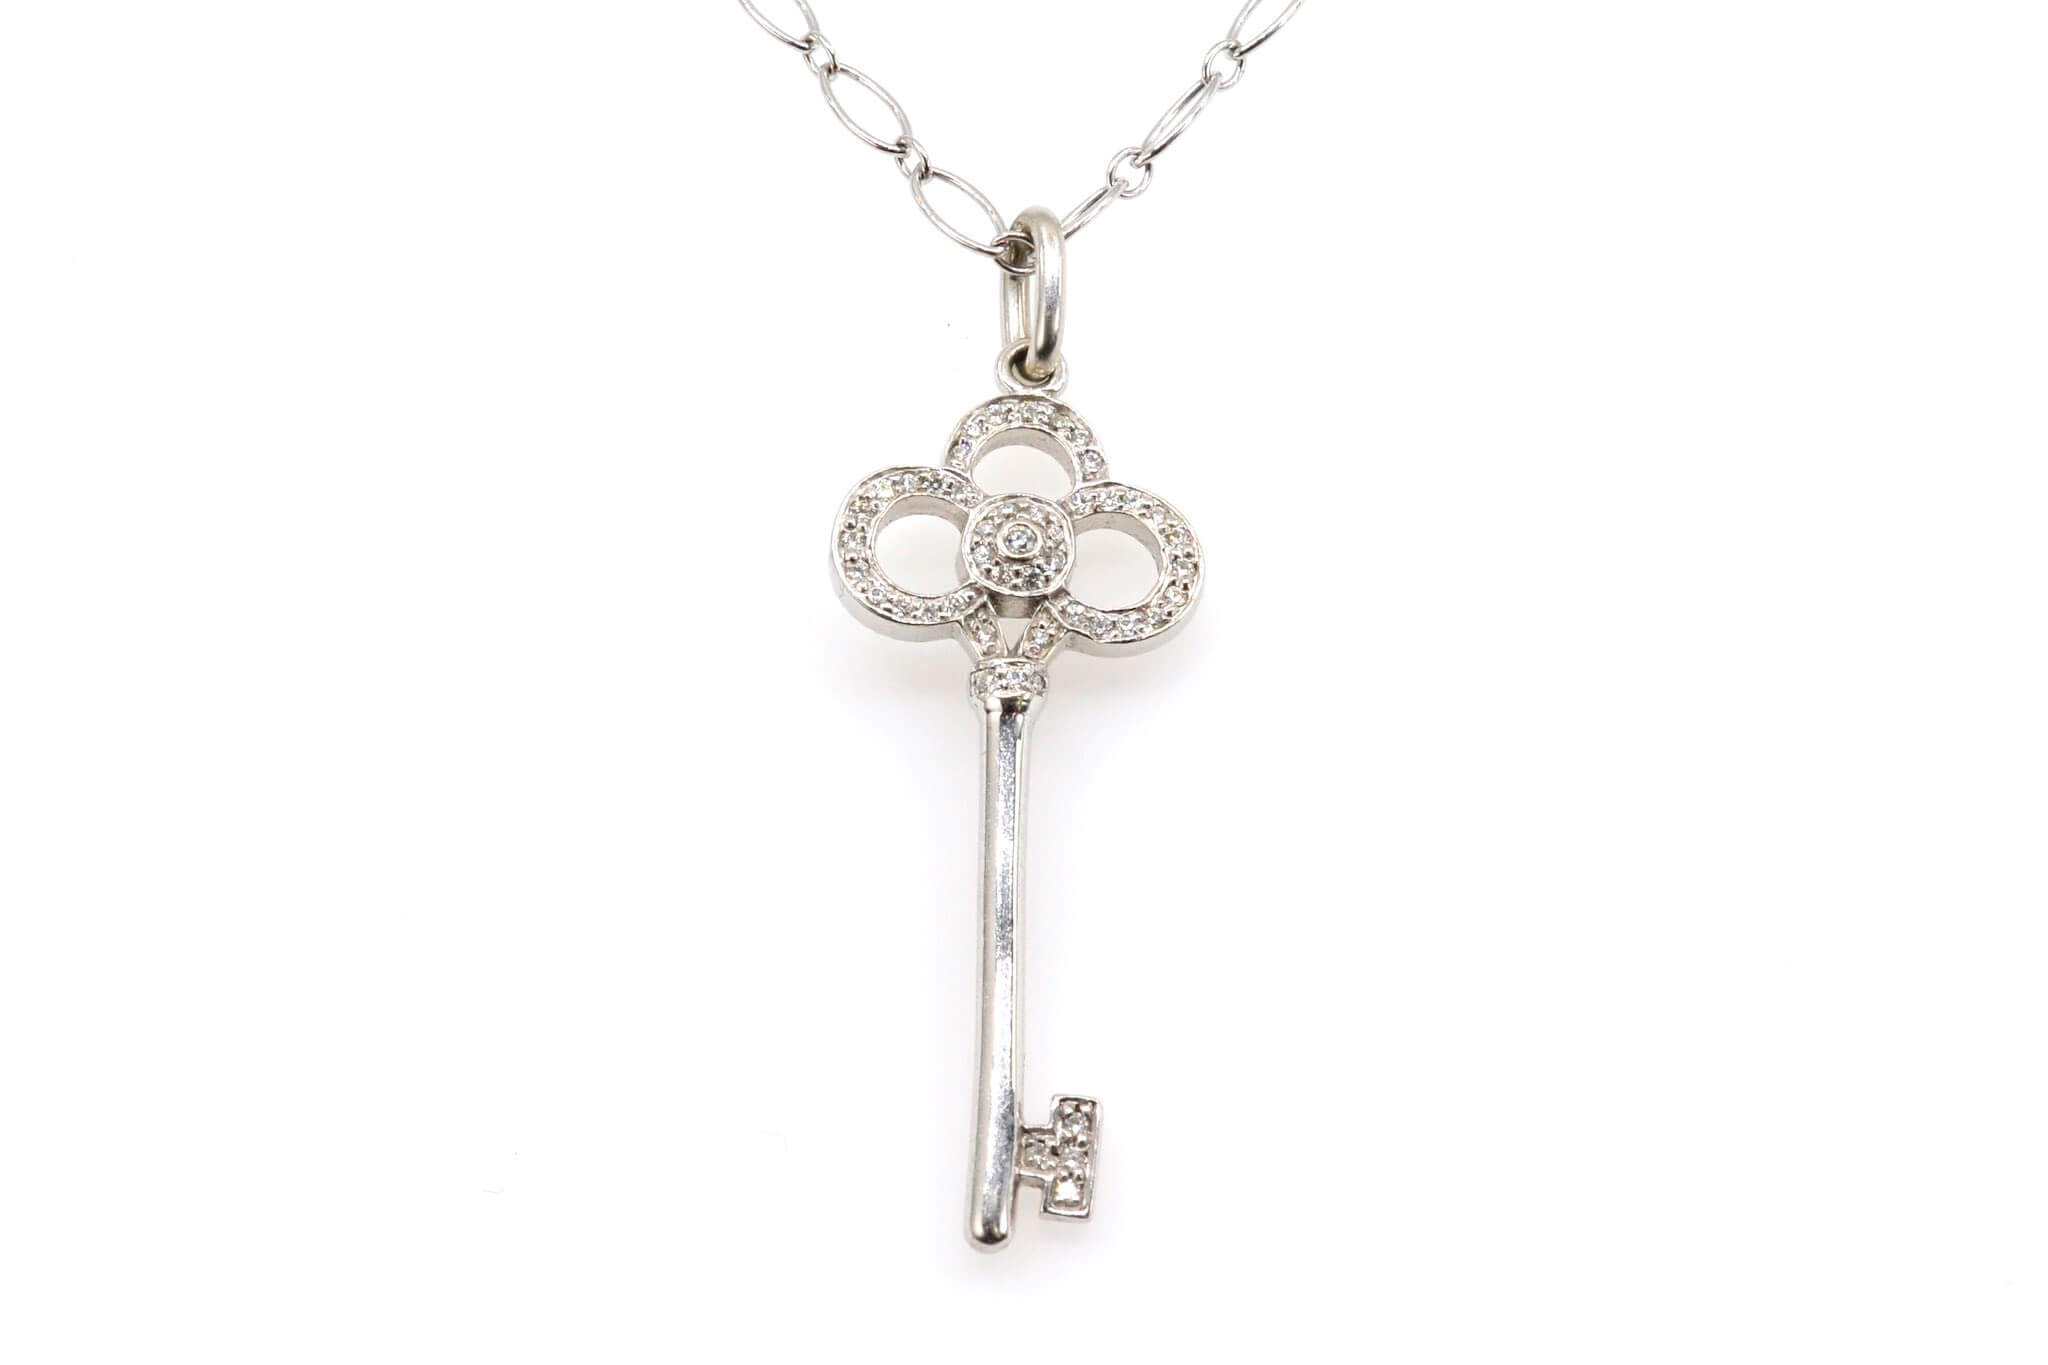 Collier Tiffany & Co pendentif clé signé